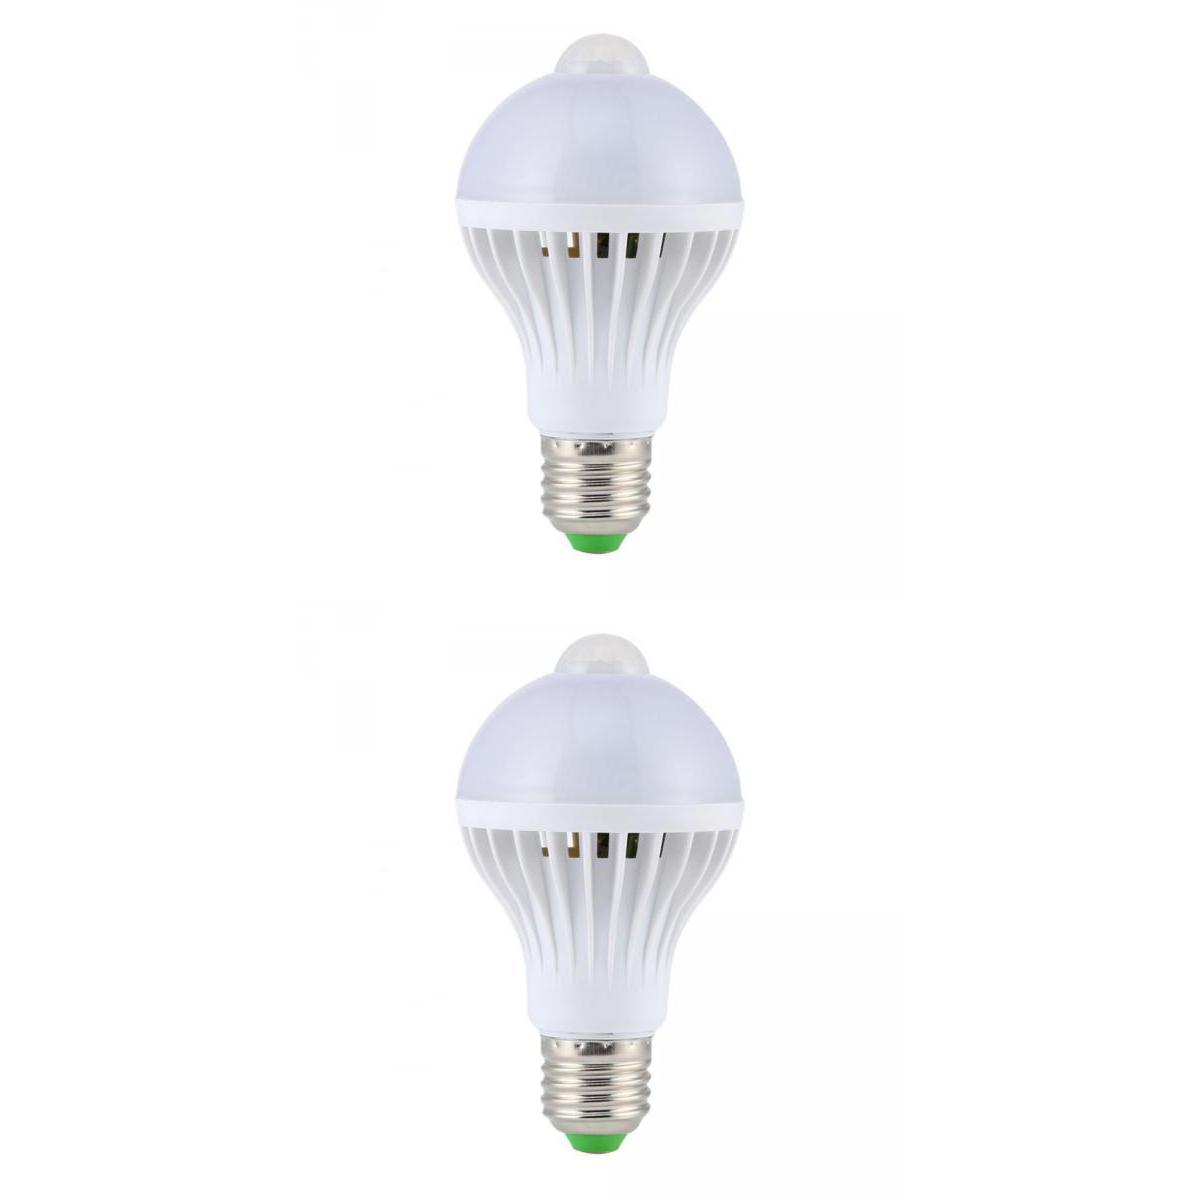 Buy Bmw R1150rt Piaa 1100x Driving Lights Auxiliary Lamp Kit Your 200w Flasher 110v 50 60hz Led Pir Motion Sensor Auto Bulb Infrared Light 7w 9w Free Shippi